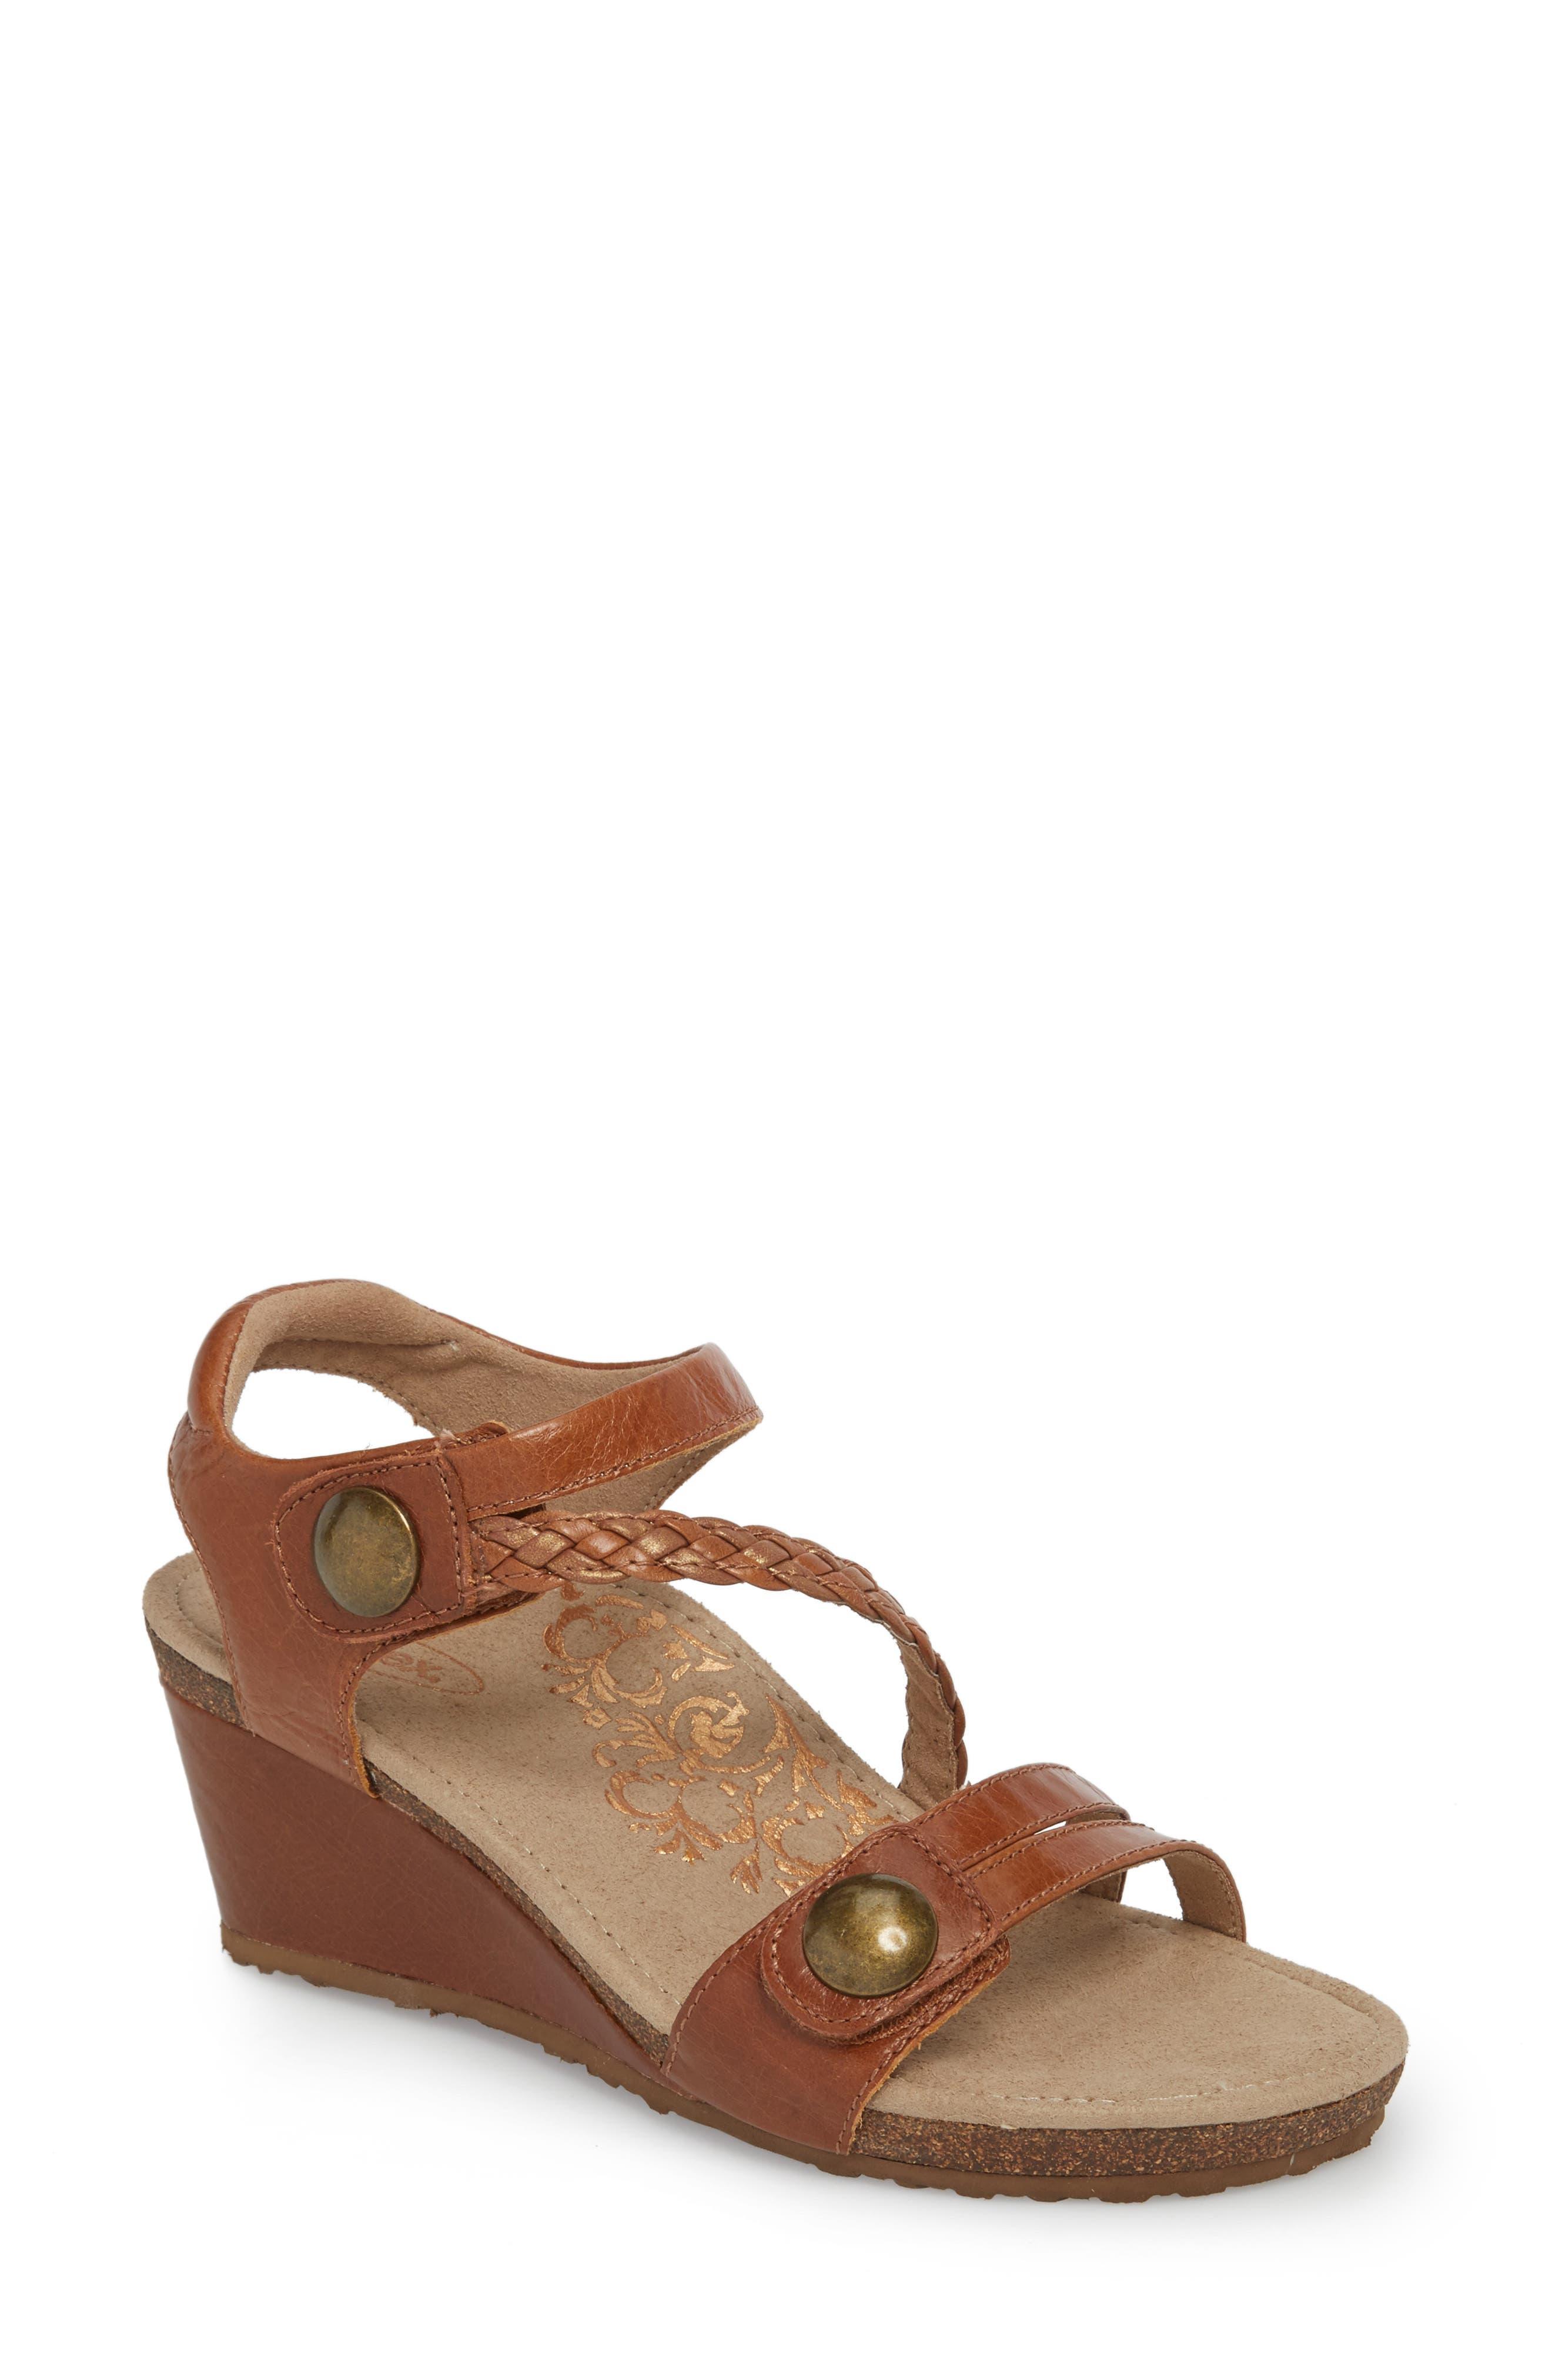 'Naya' Wedge Sandal,                         Main,                         color, Cognac Leather